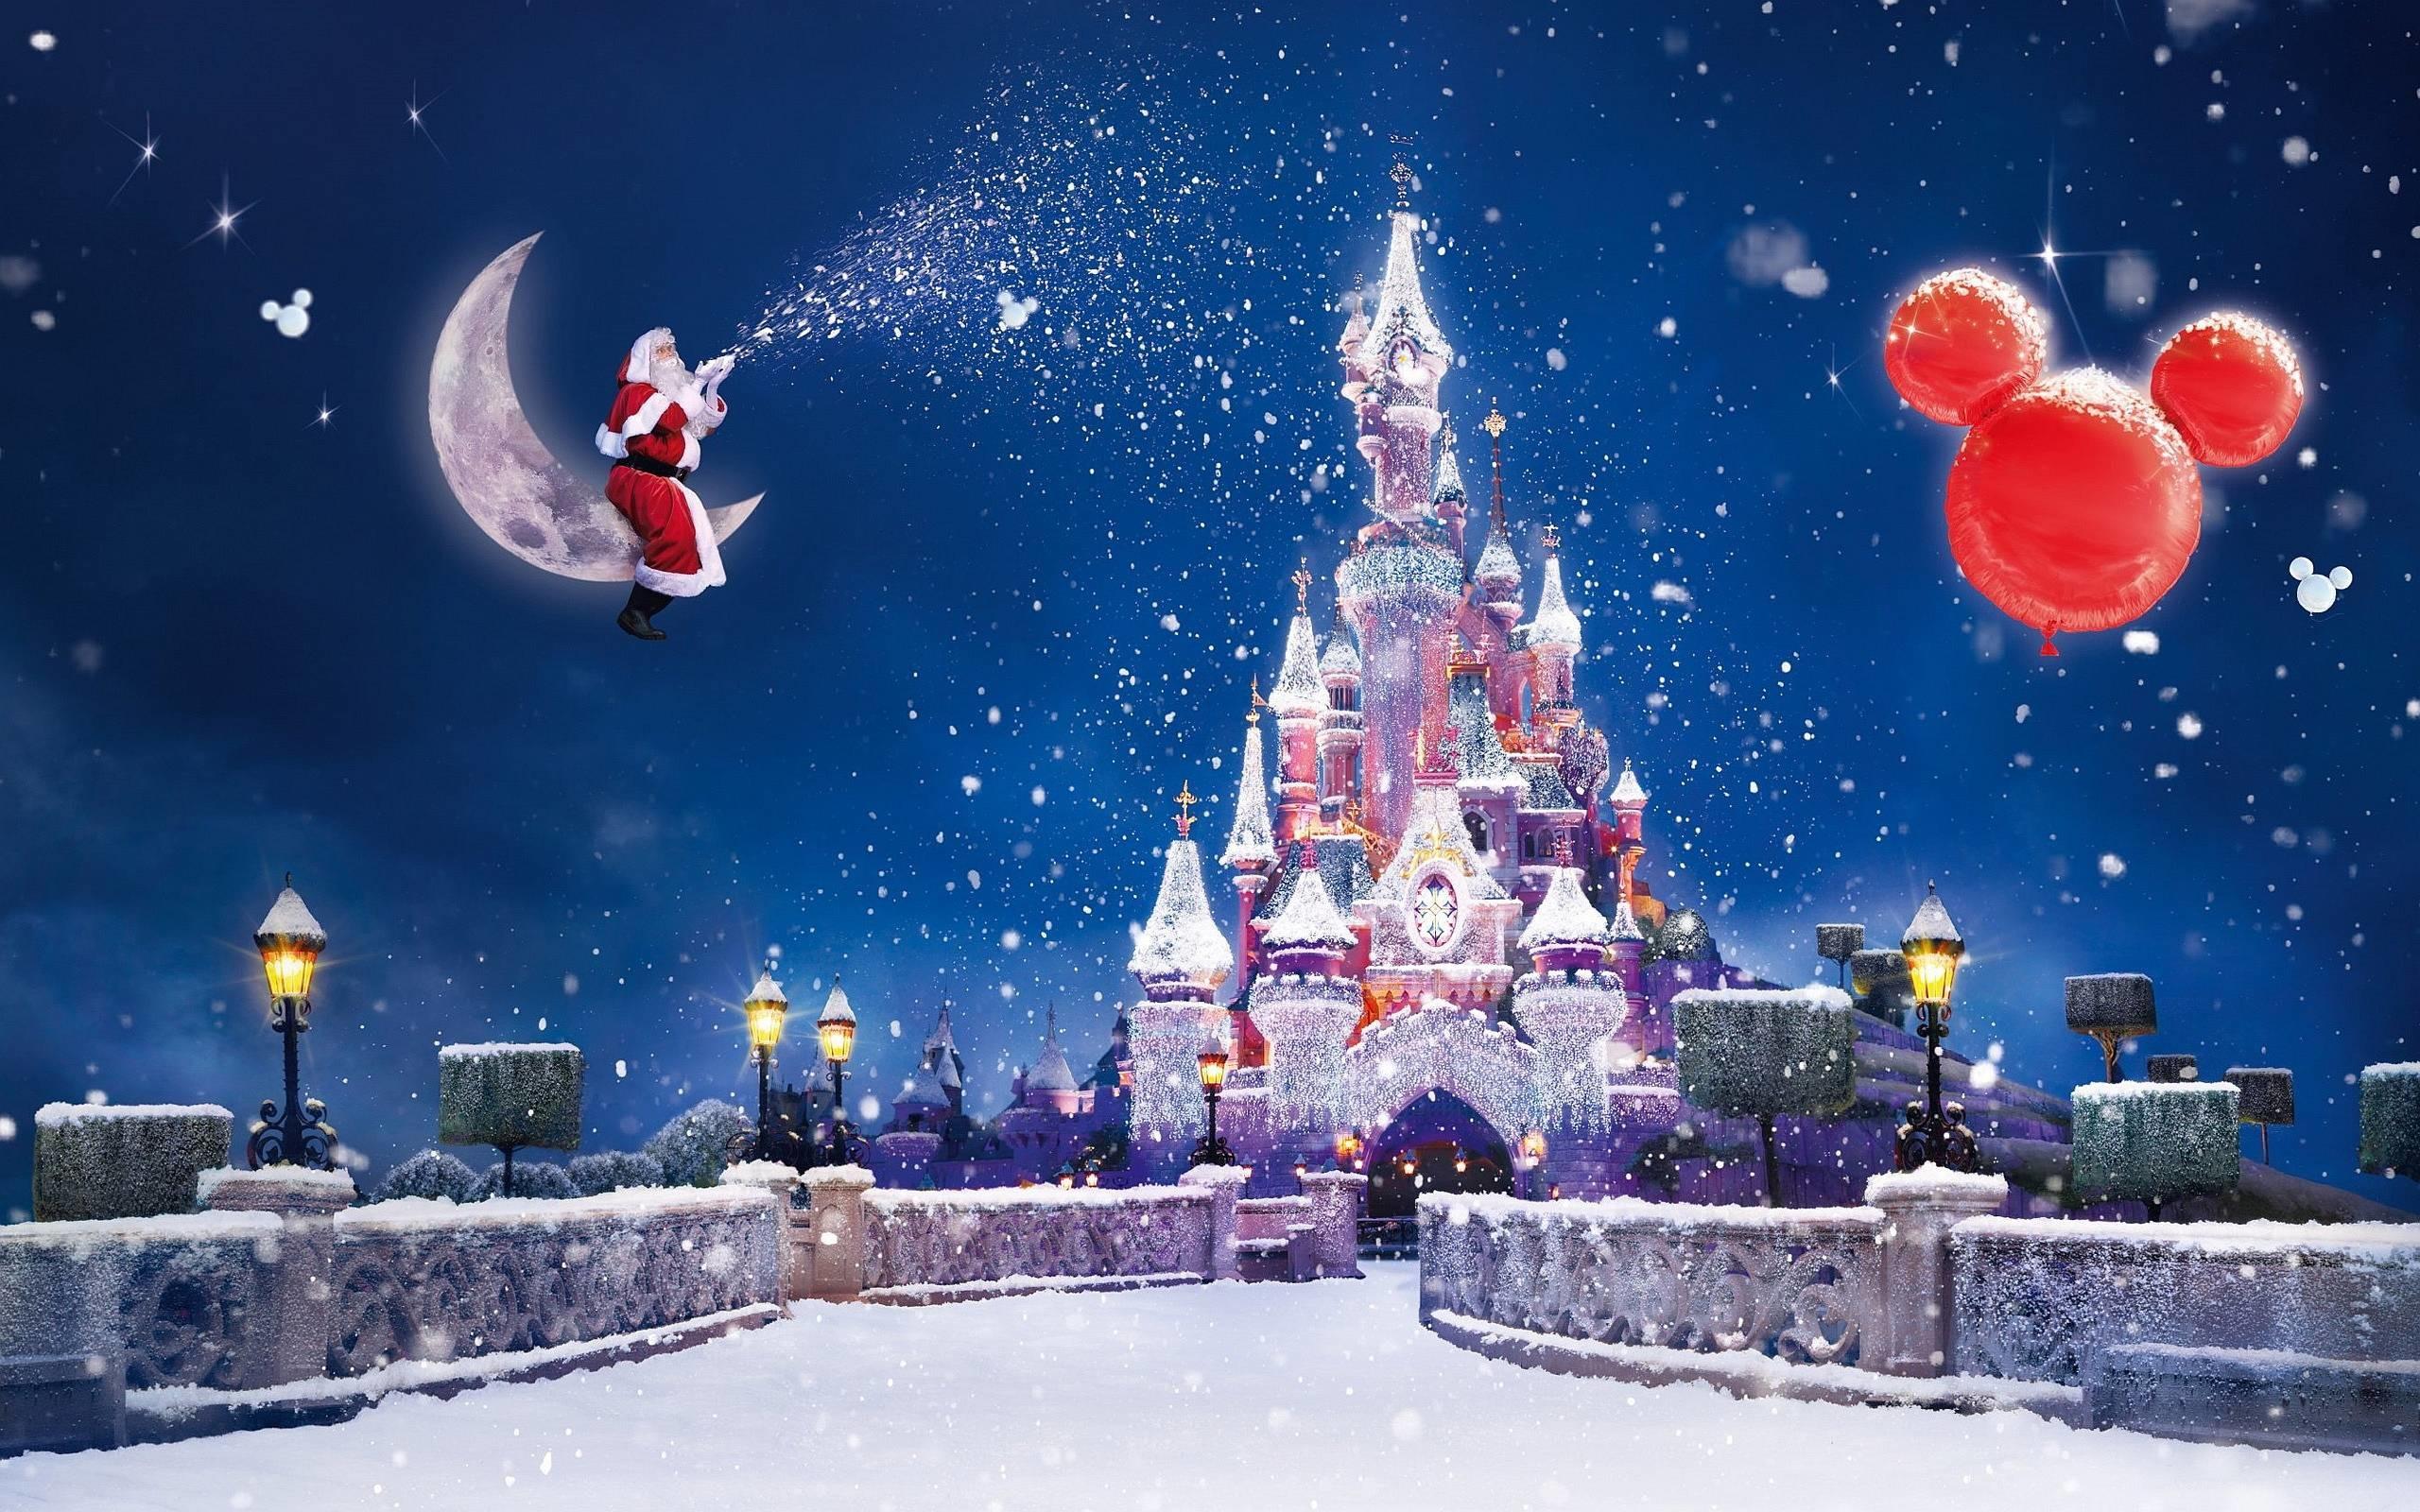 Disney Christmas Wallpaper And Screensavers (57+ Images